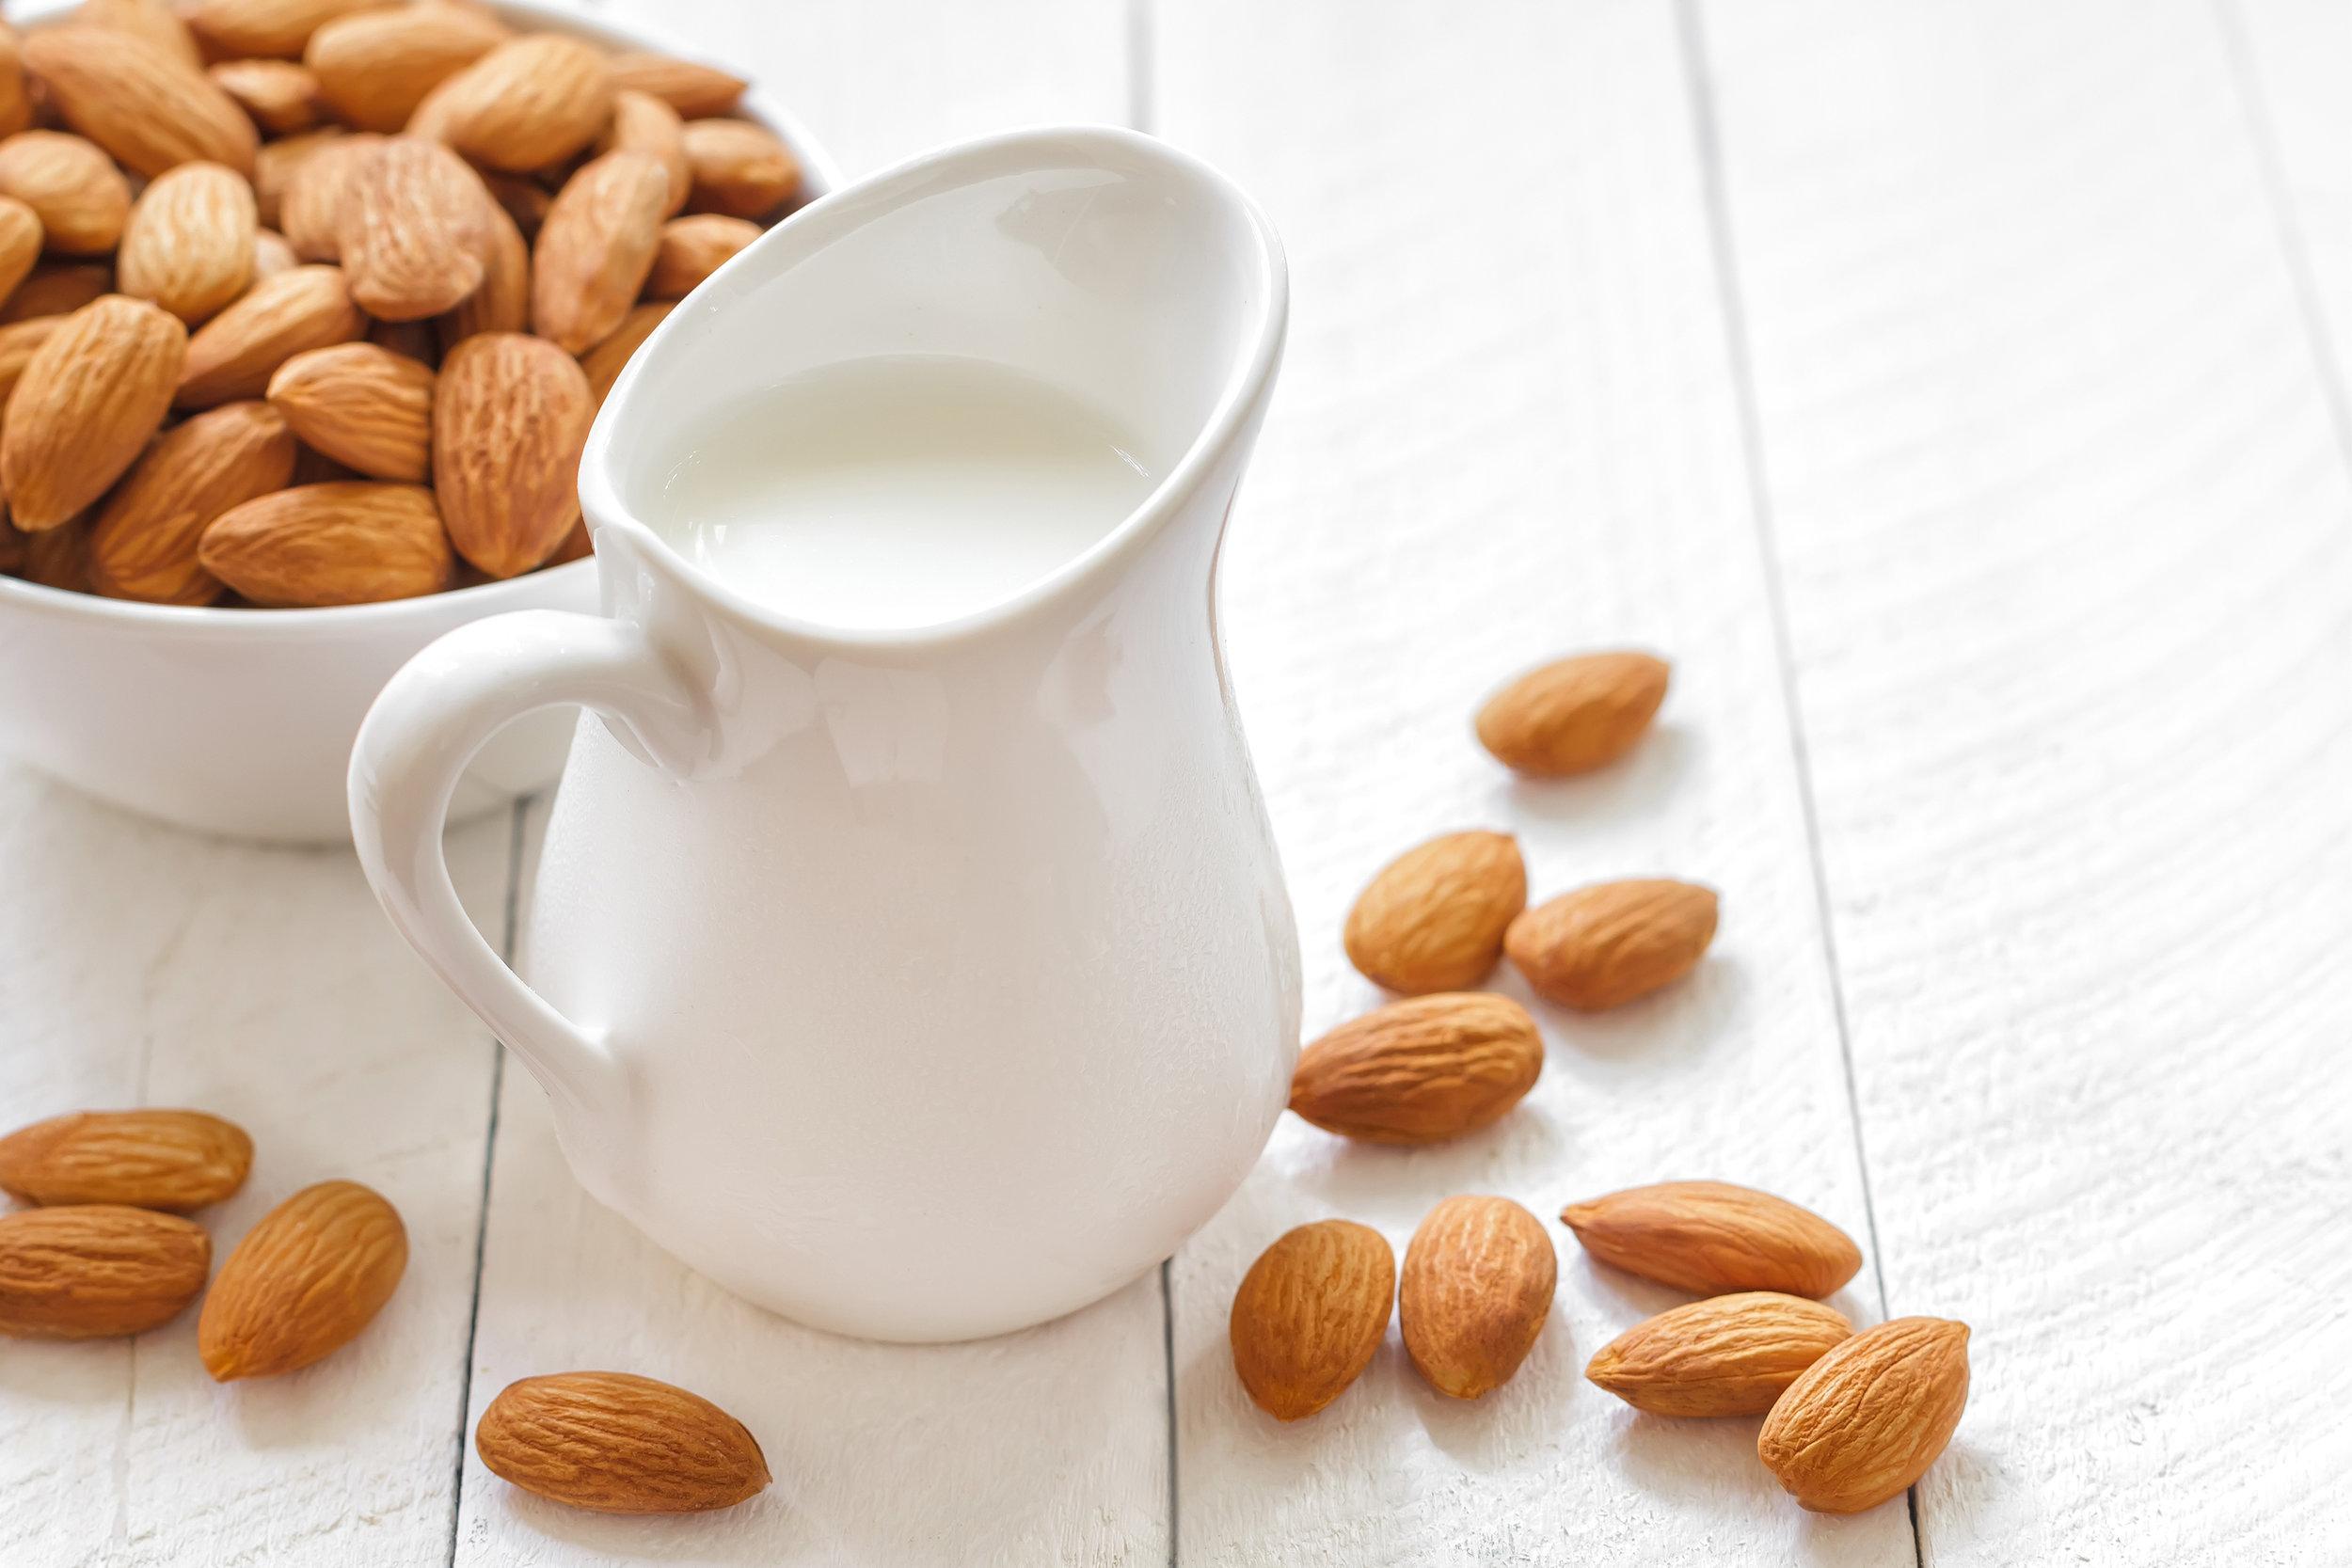 bigstock-Almond-milk-50849717.jpg